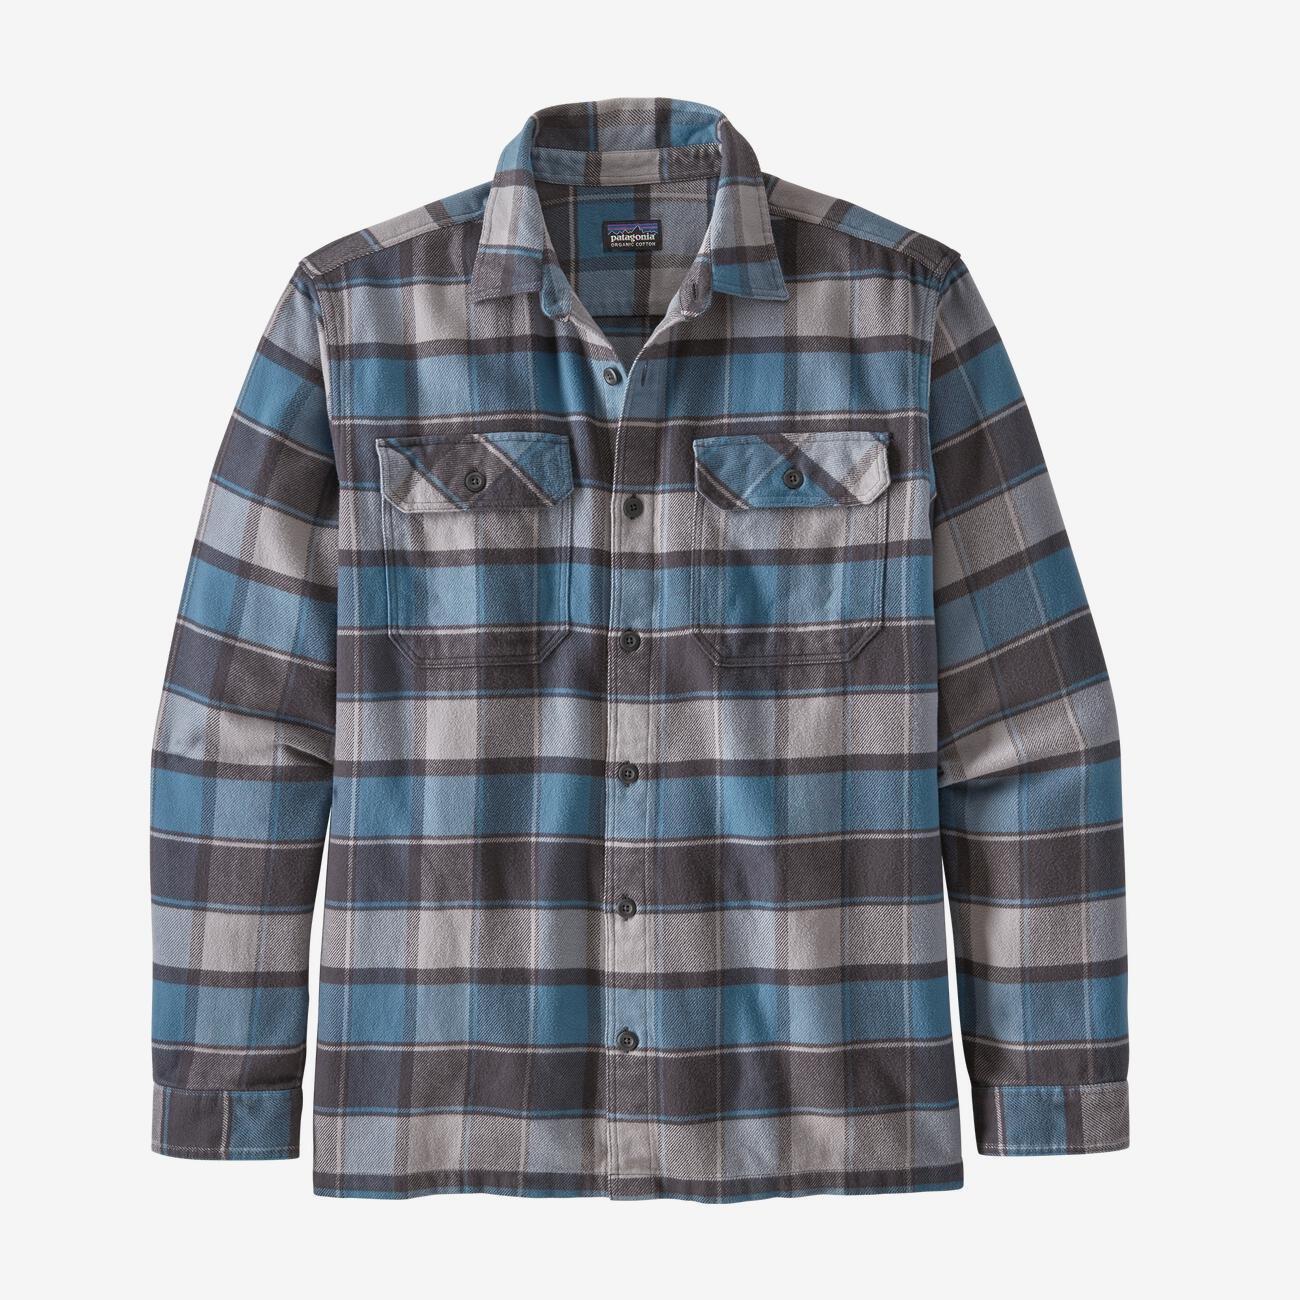 Men's Patagonia Fjord Flannel Shirt - Pigeon Blue